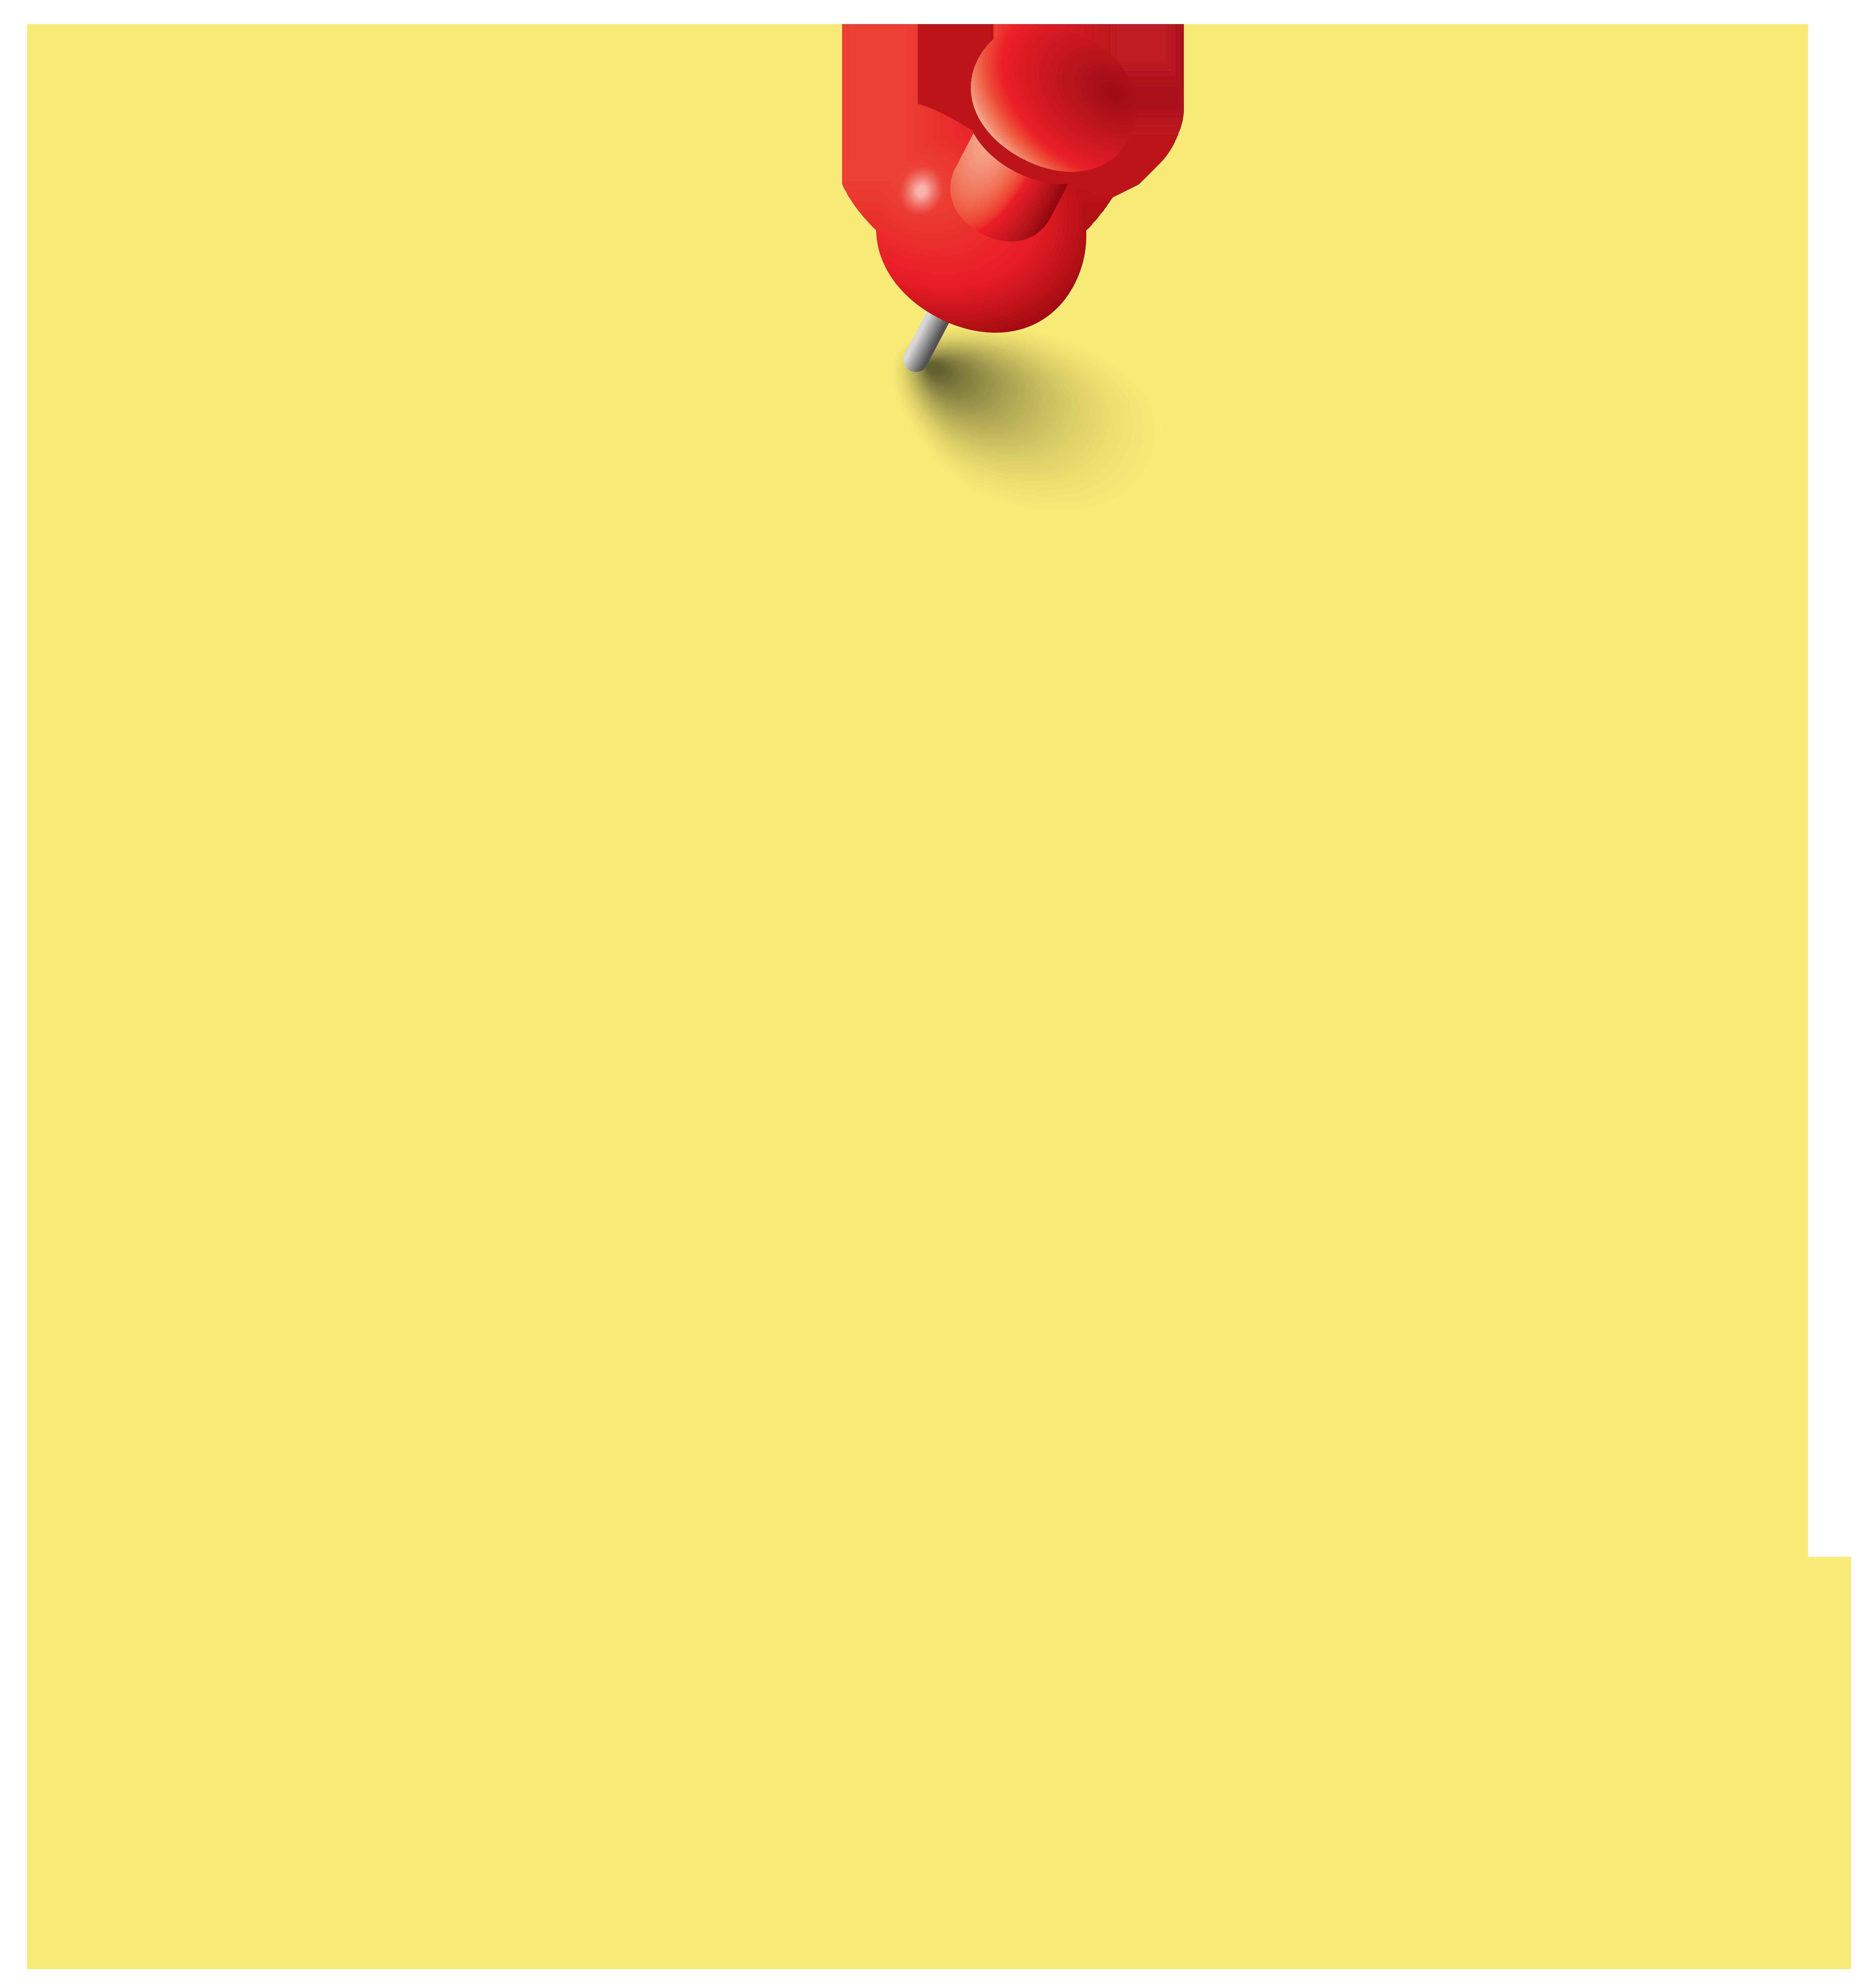 Sticky Note PNG Clip Art Image.